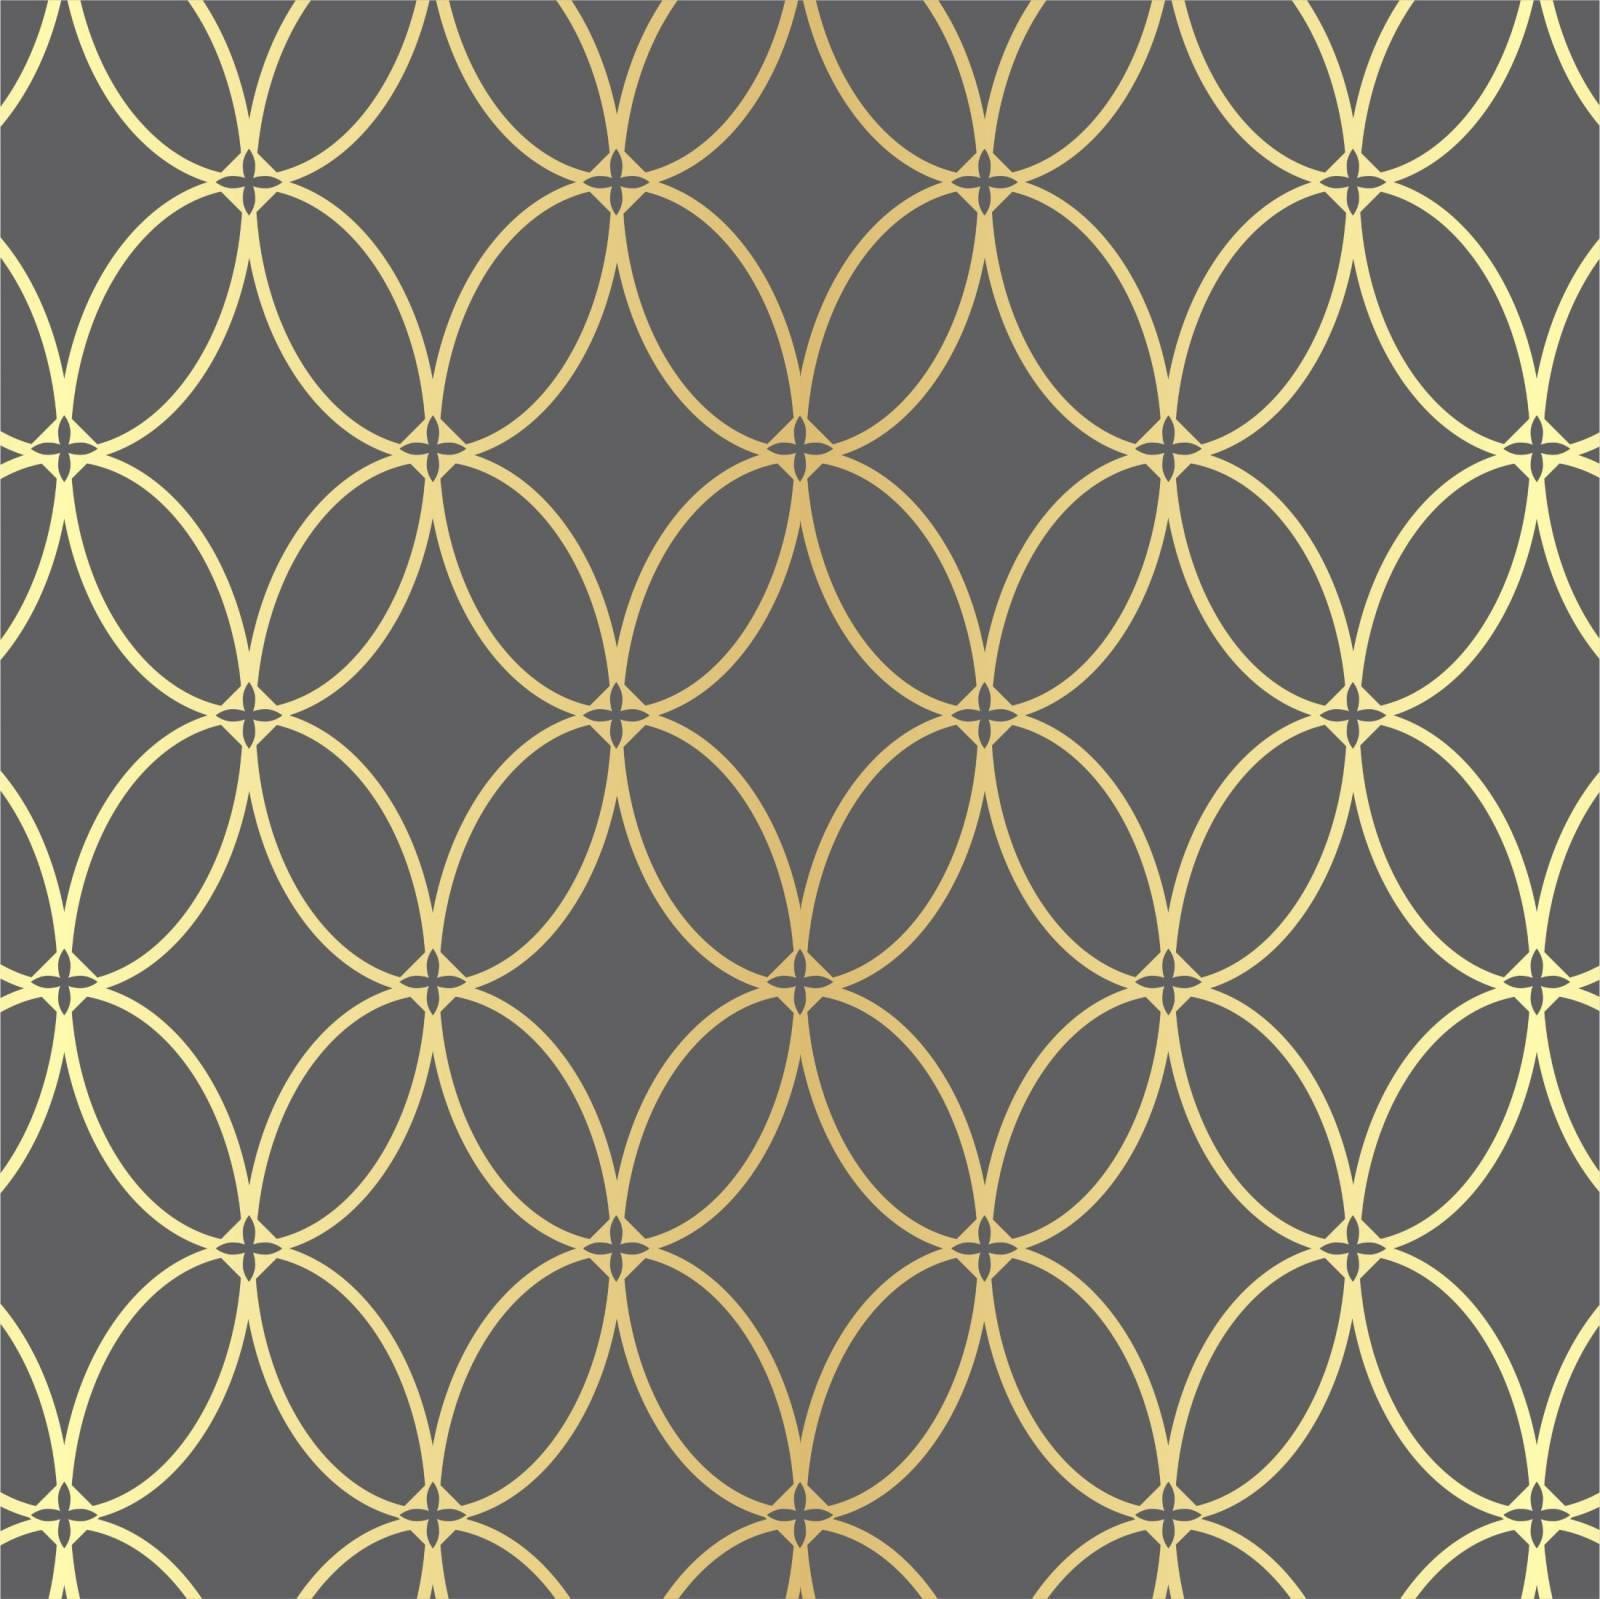 Papel de Parede Adesivo Geometrico  /Rolo